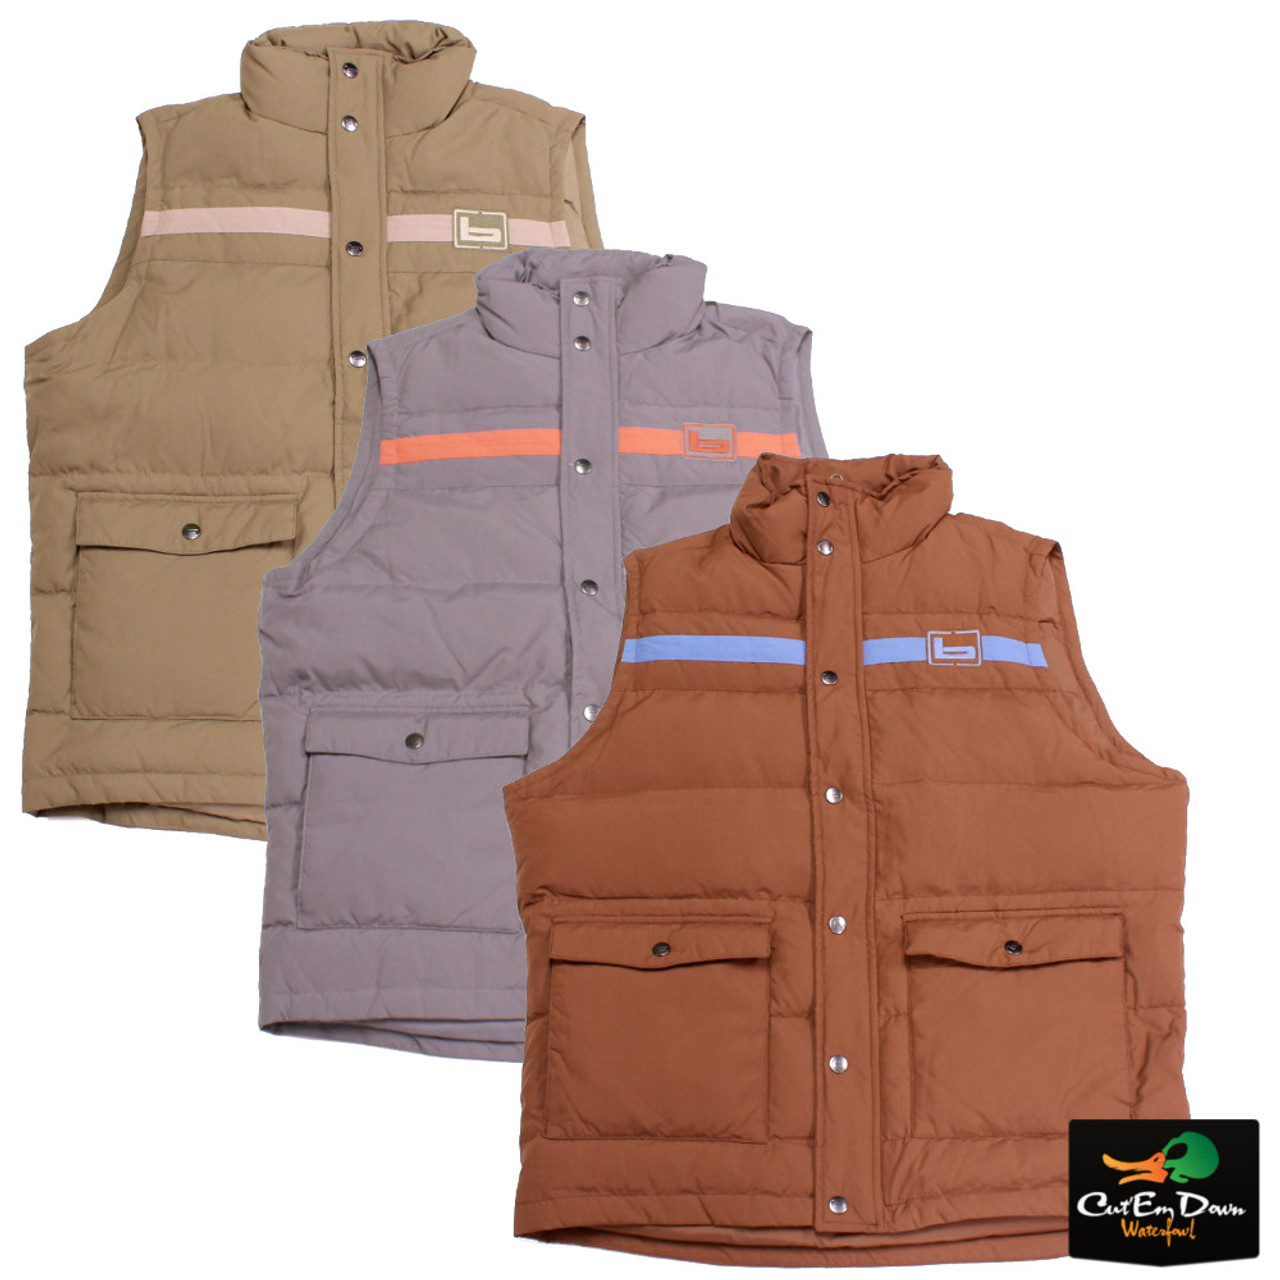 bc2b4964f7237 Banded Gear Vintage Down Vest